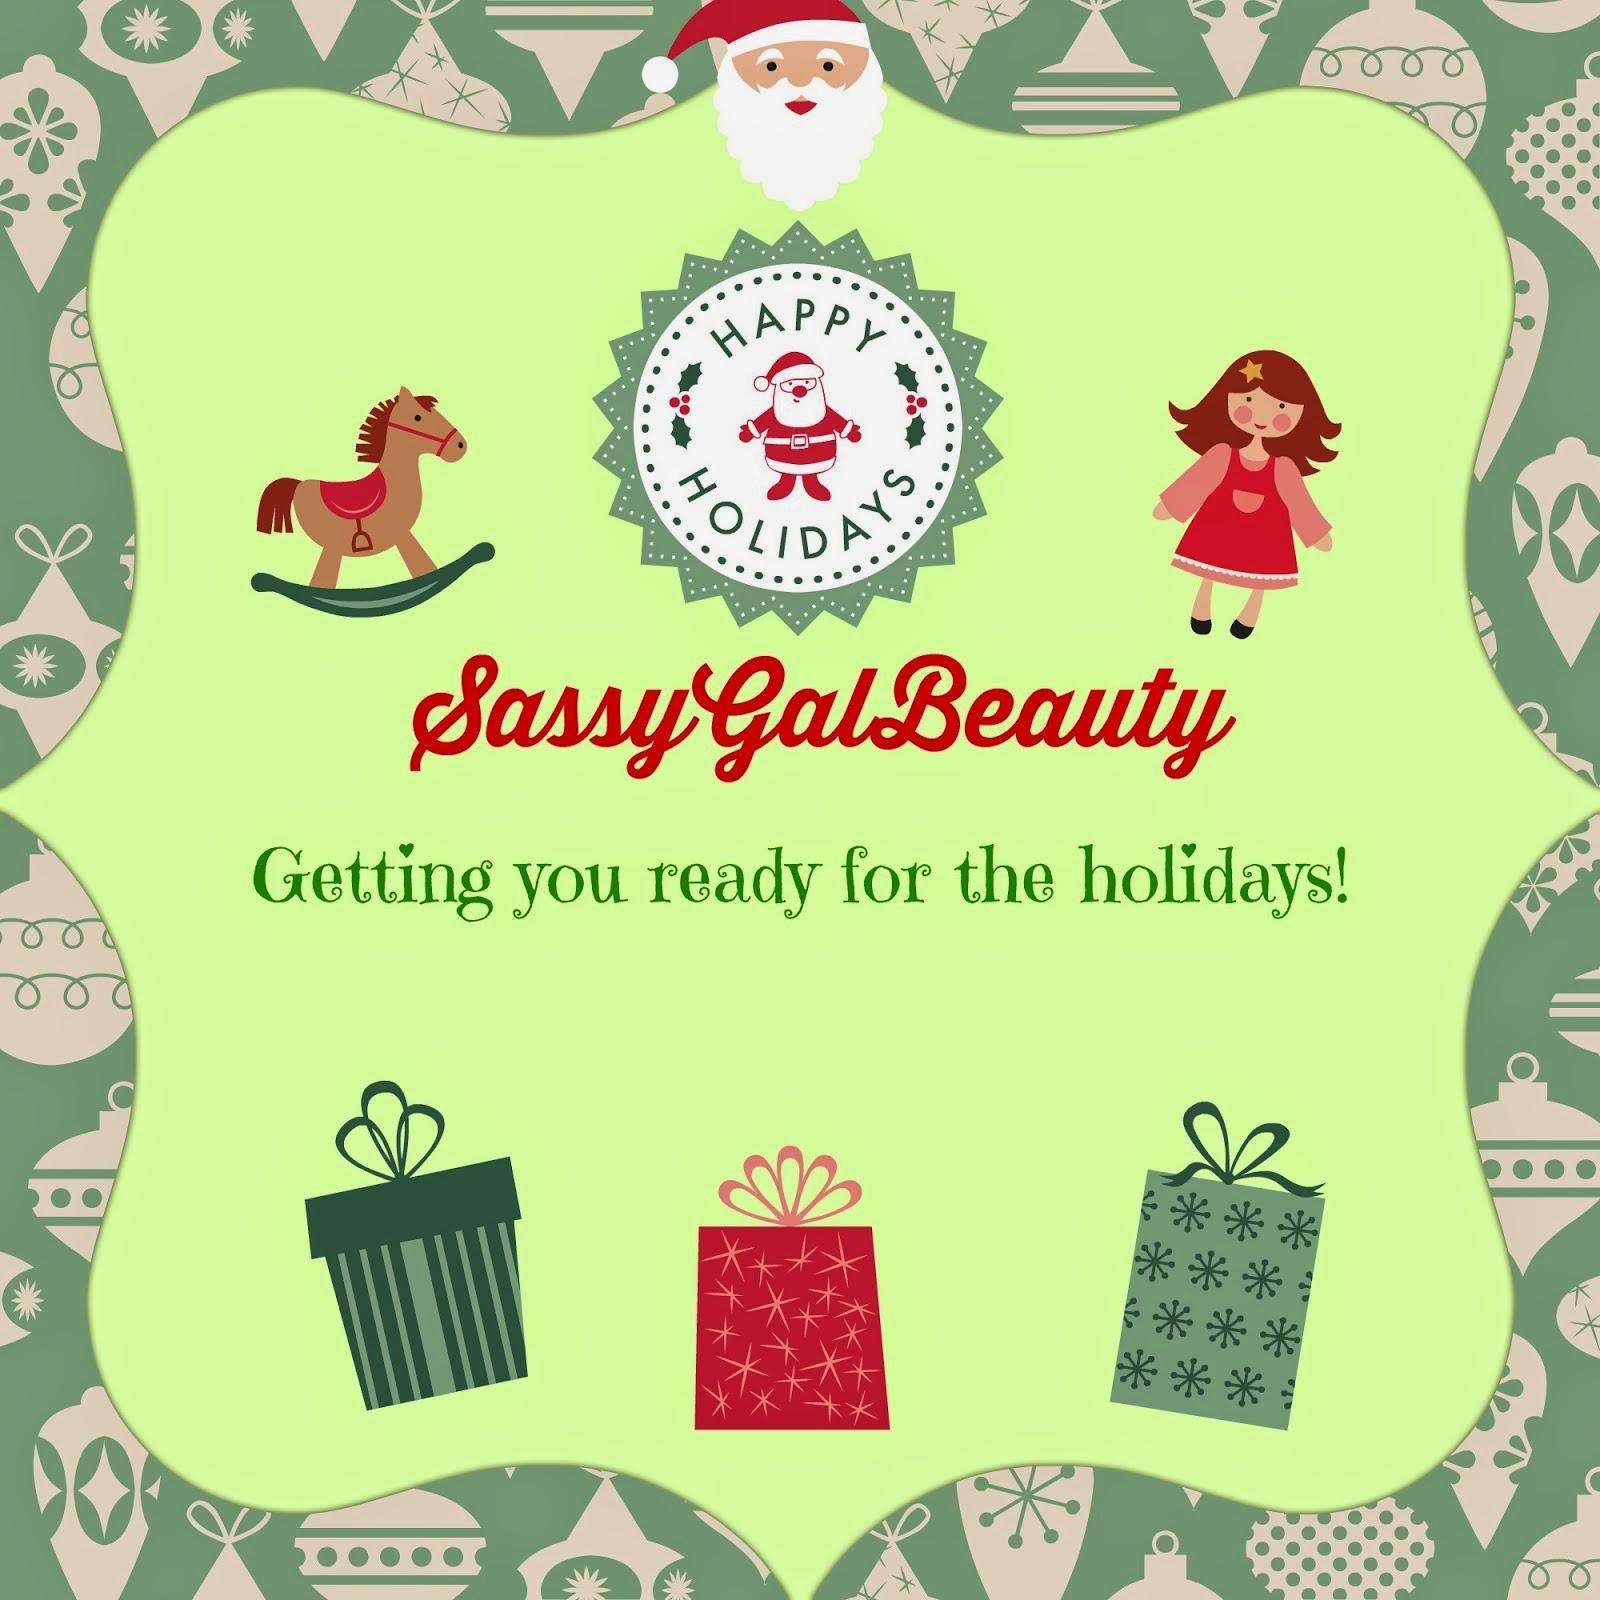 SassyHolidays Gift Guide